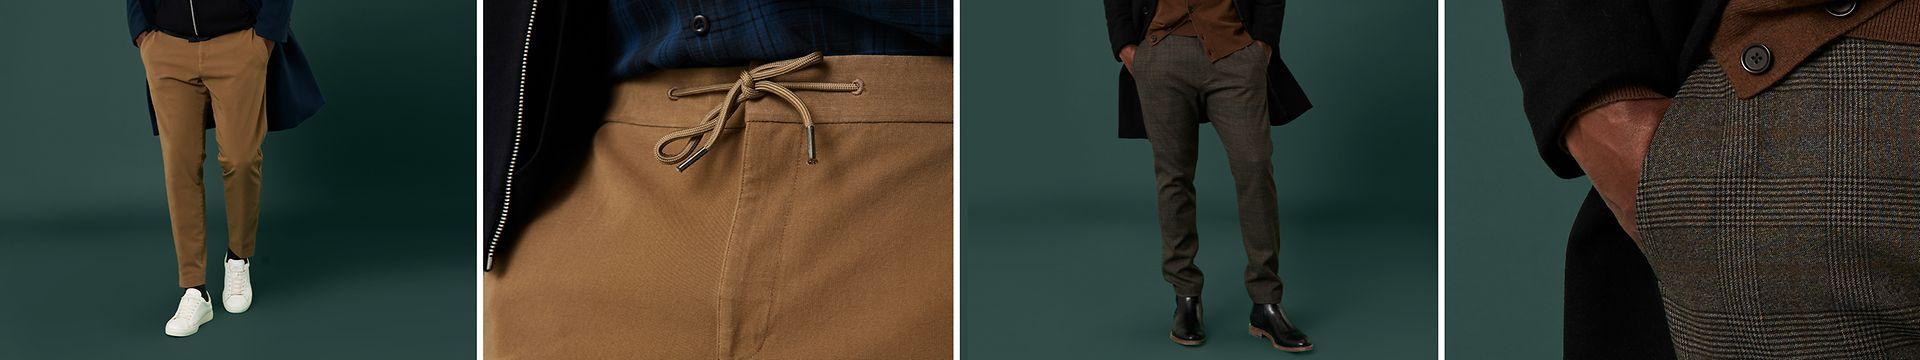 412021 - men - tc banner - new pants fit - img